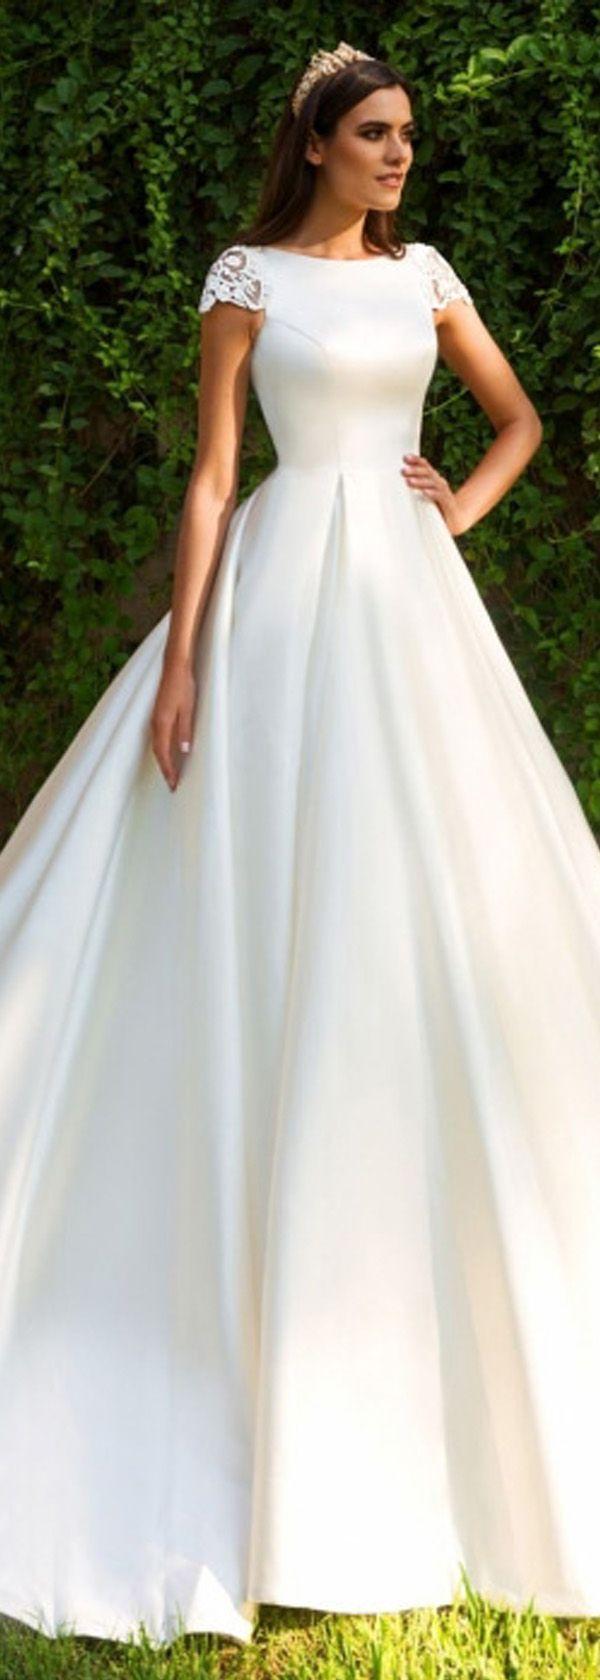 Beautiful Romantic Tulle u Satin Bateau Neckline A Line Wedding Dresses With Lace Appliques